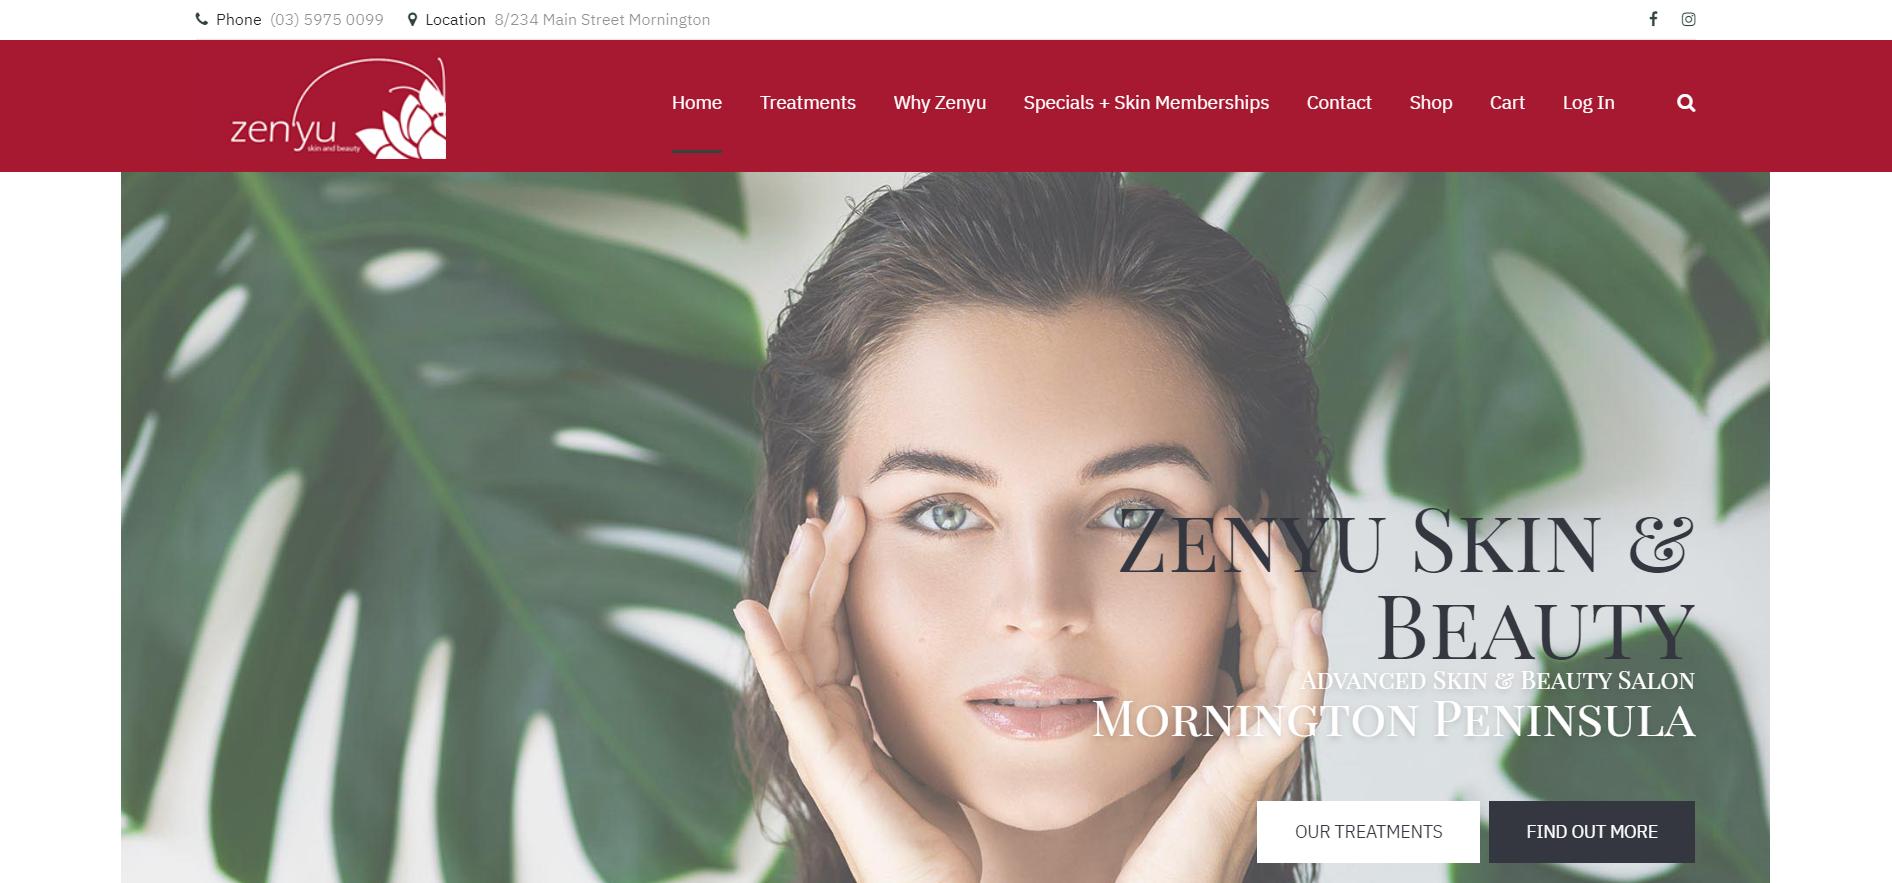 Zenyu Skin